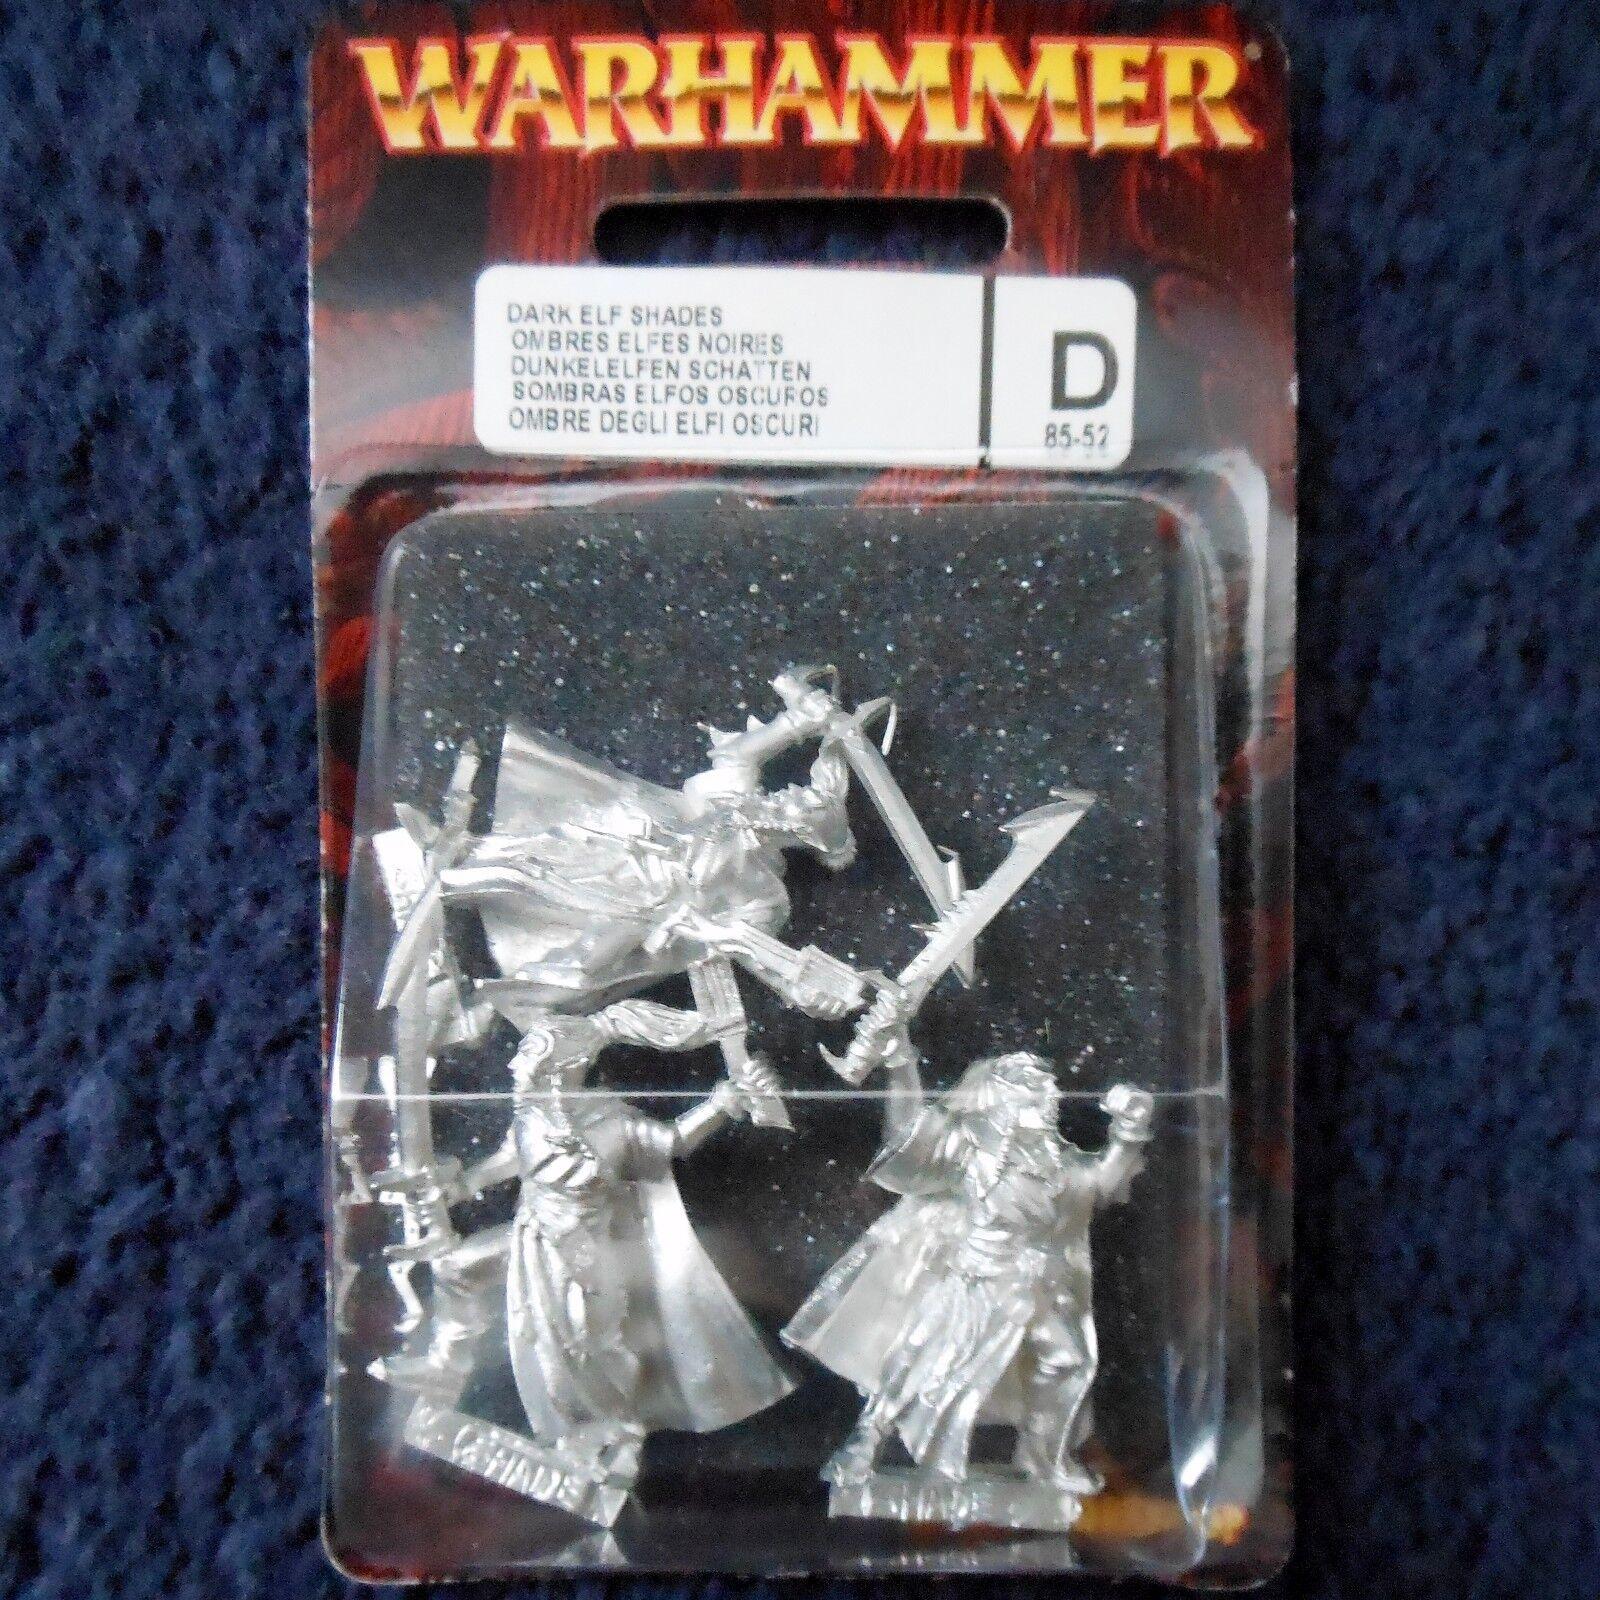 2001 Dark Elf Shade S1 Games Workshop Warrior Drow Warhammer Army Assassin MIB